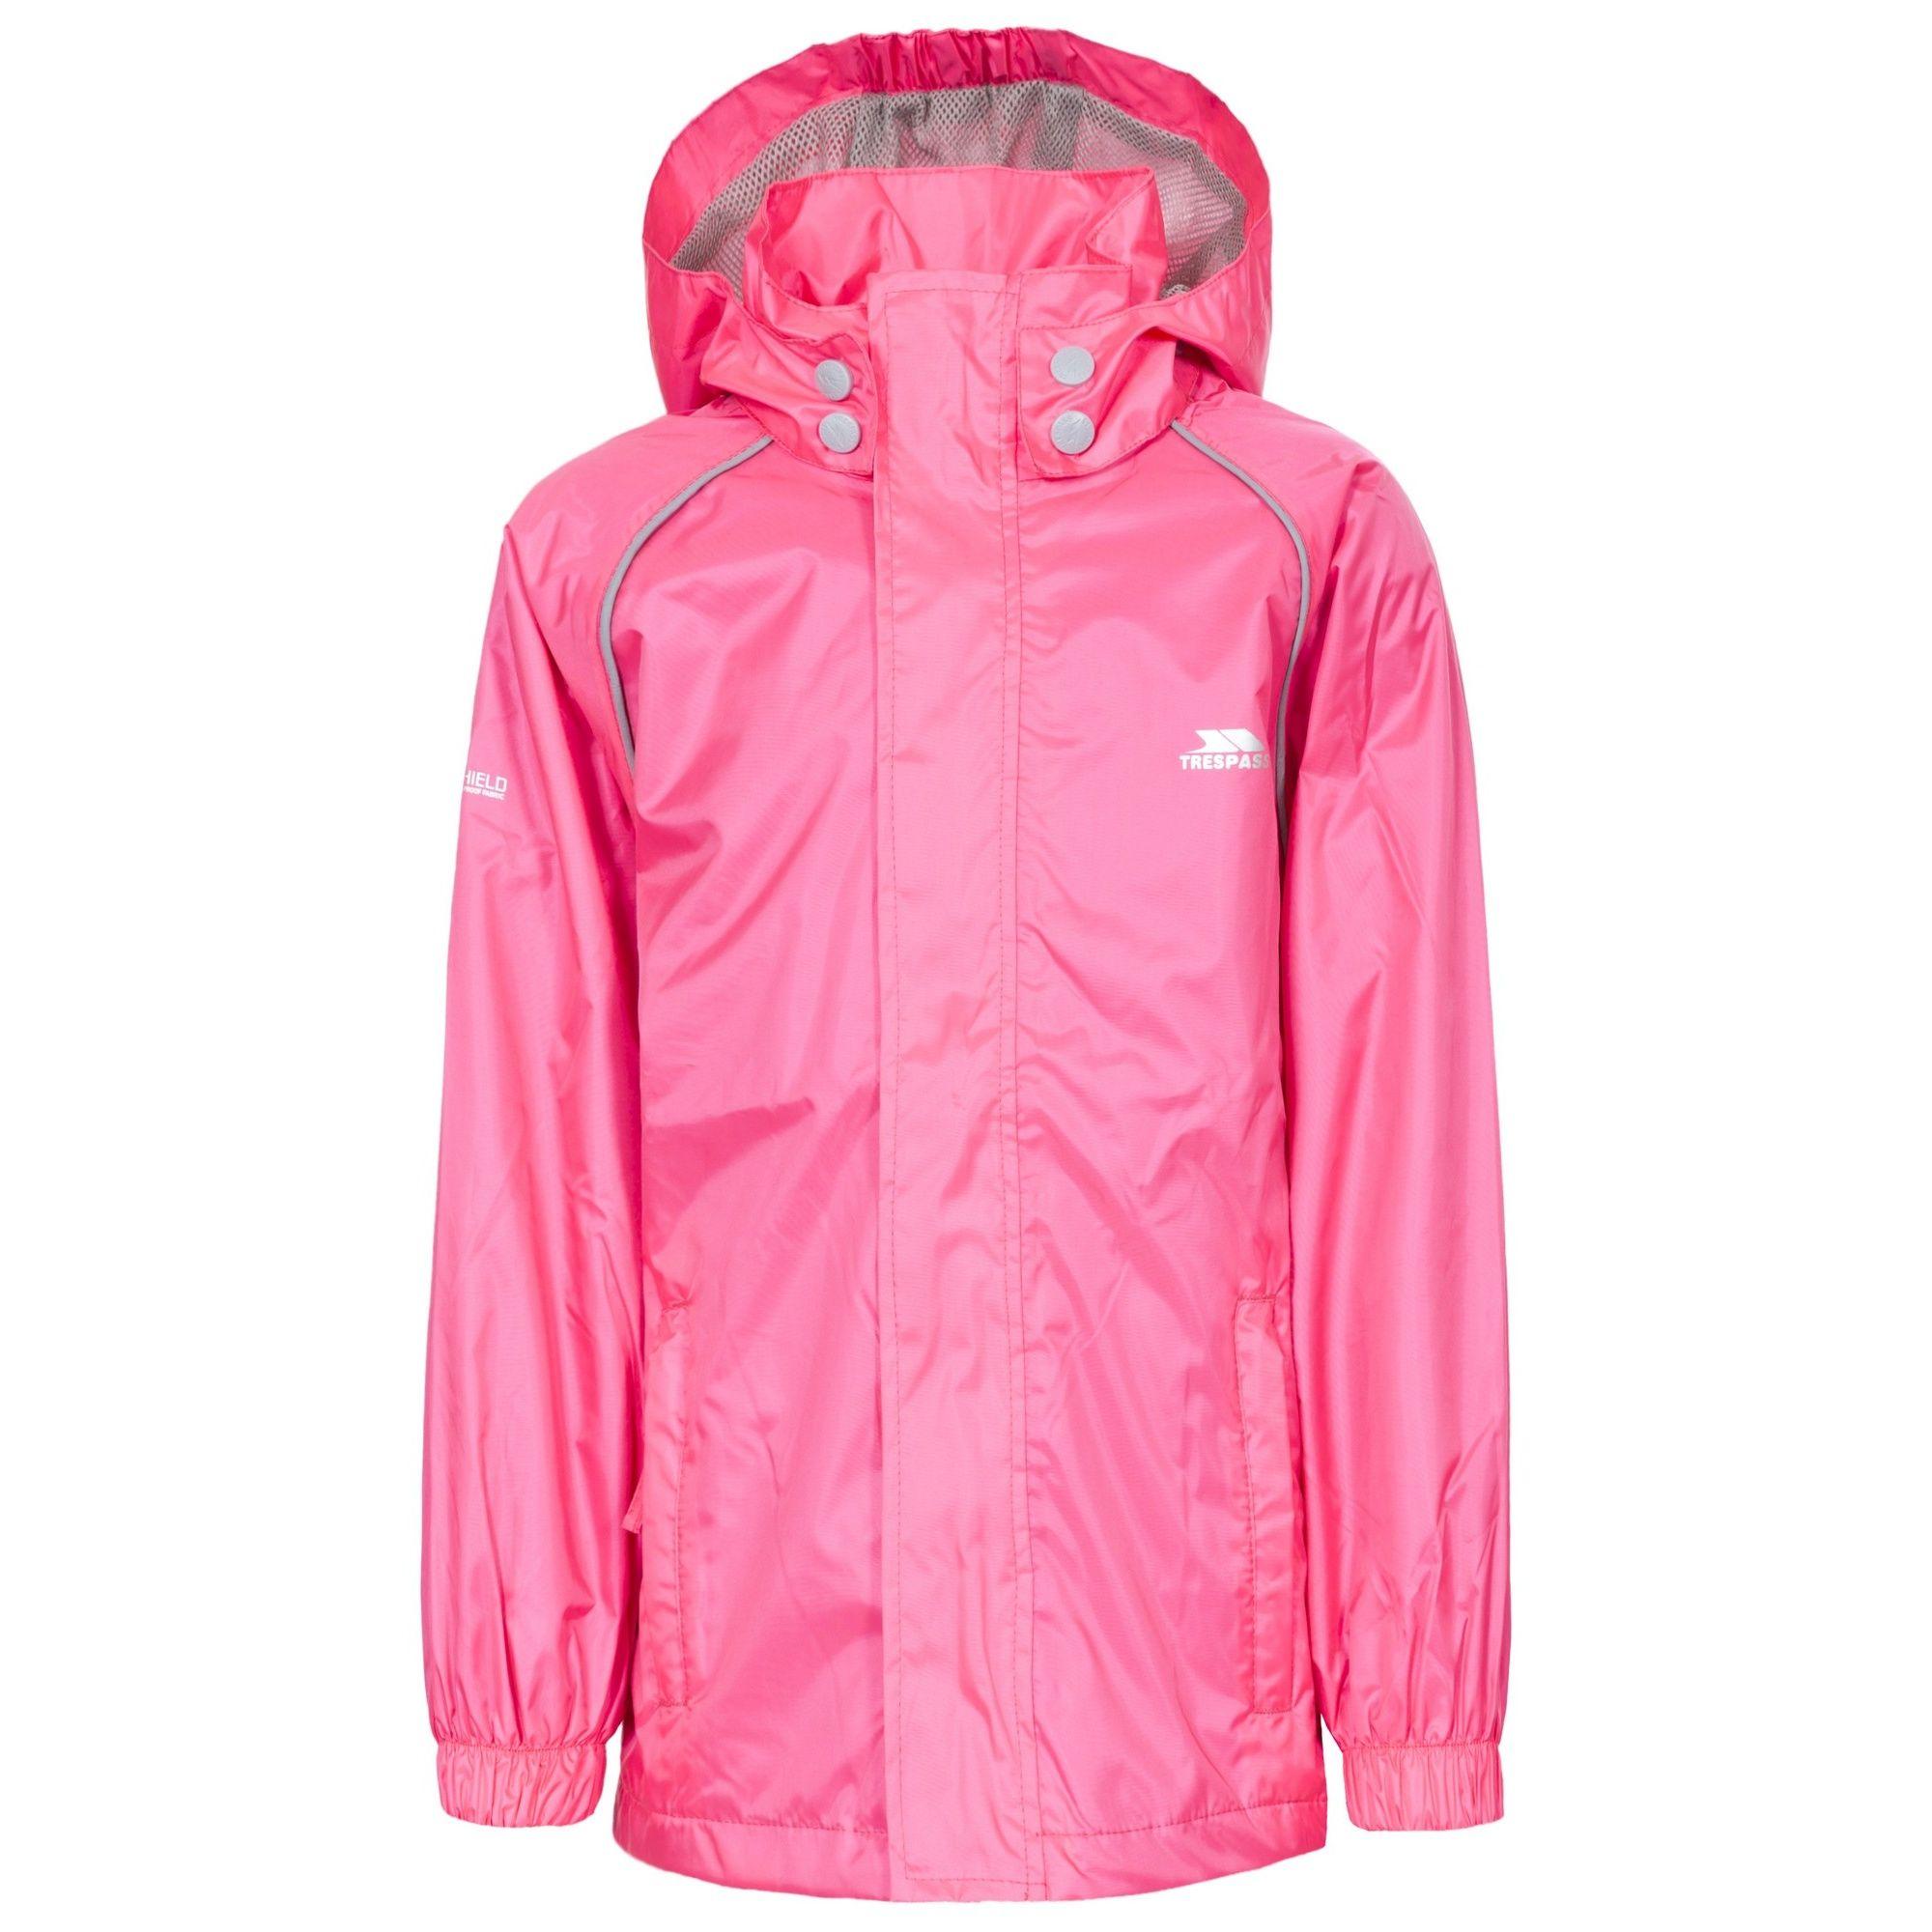 Trespass Girls Neely II Waterproof Jacket